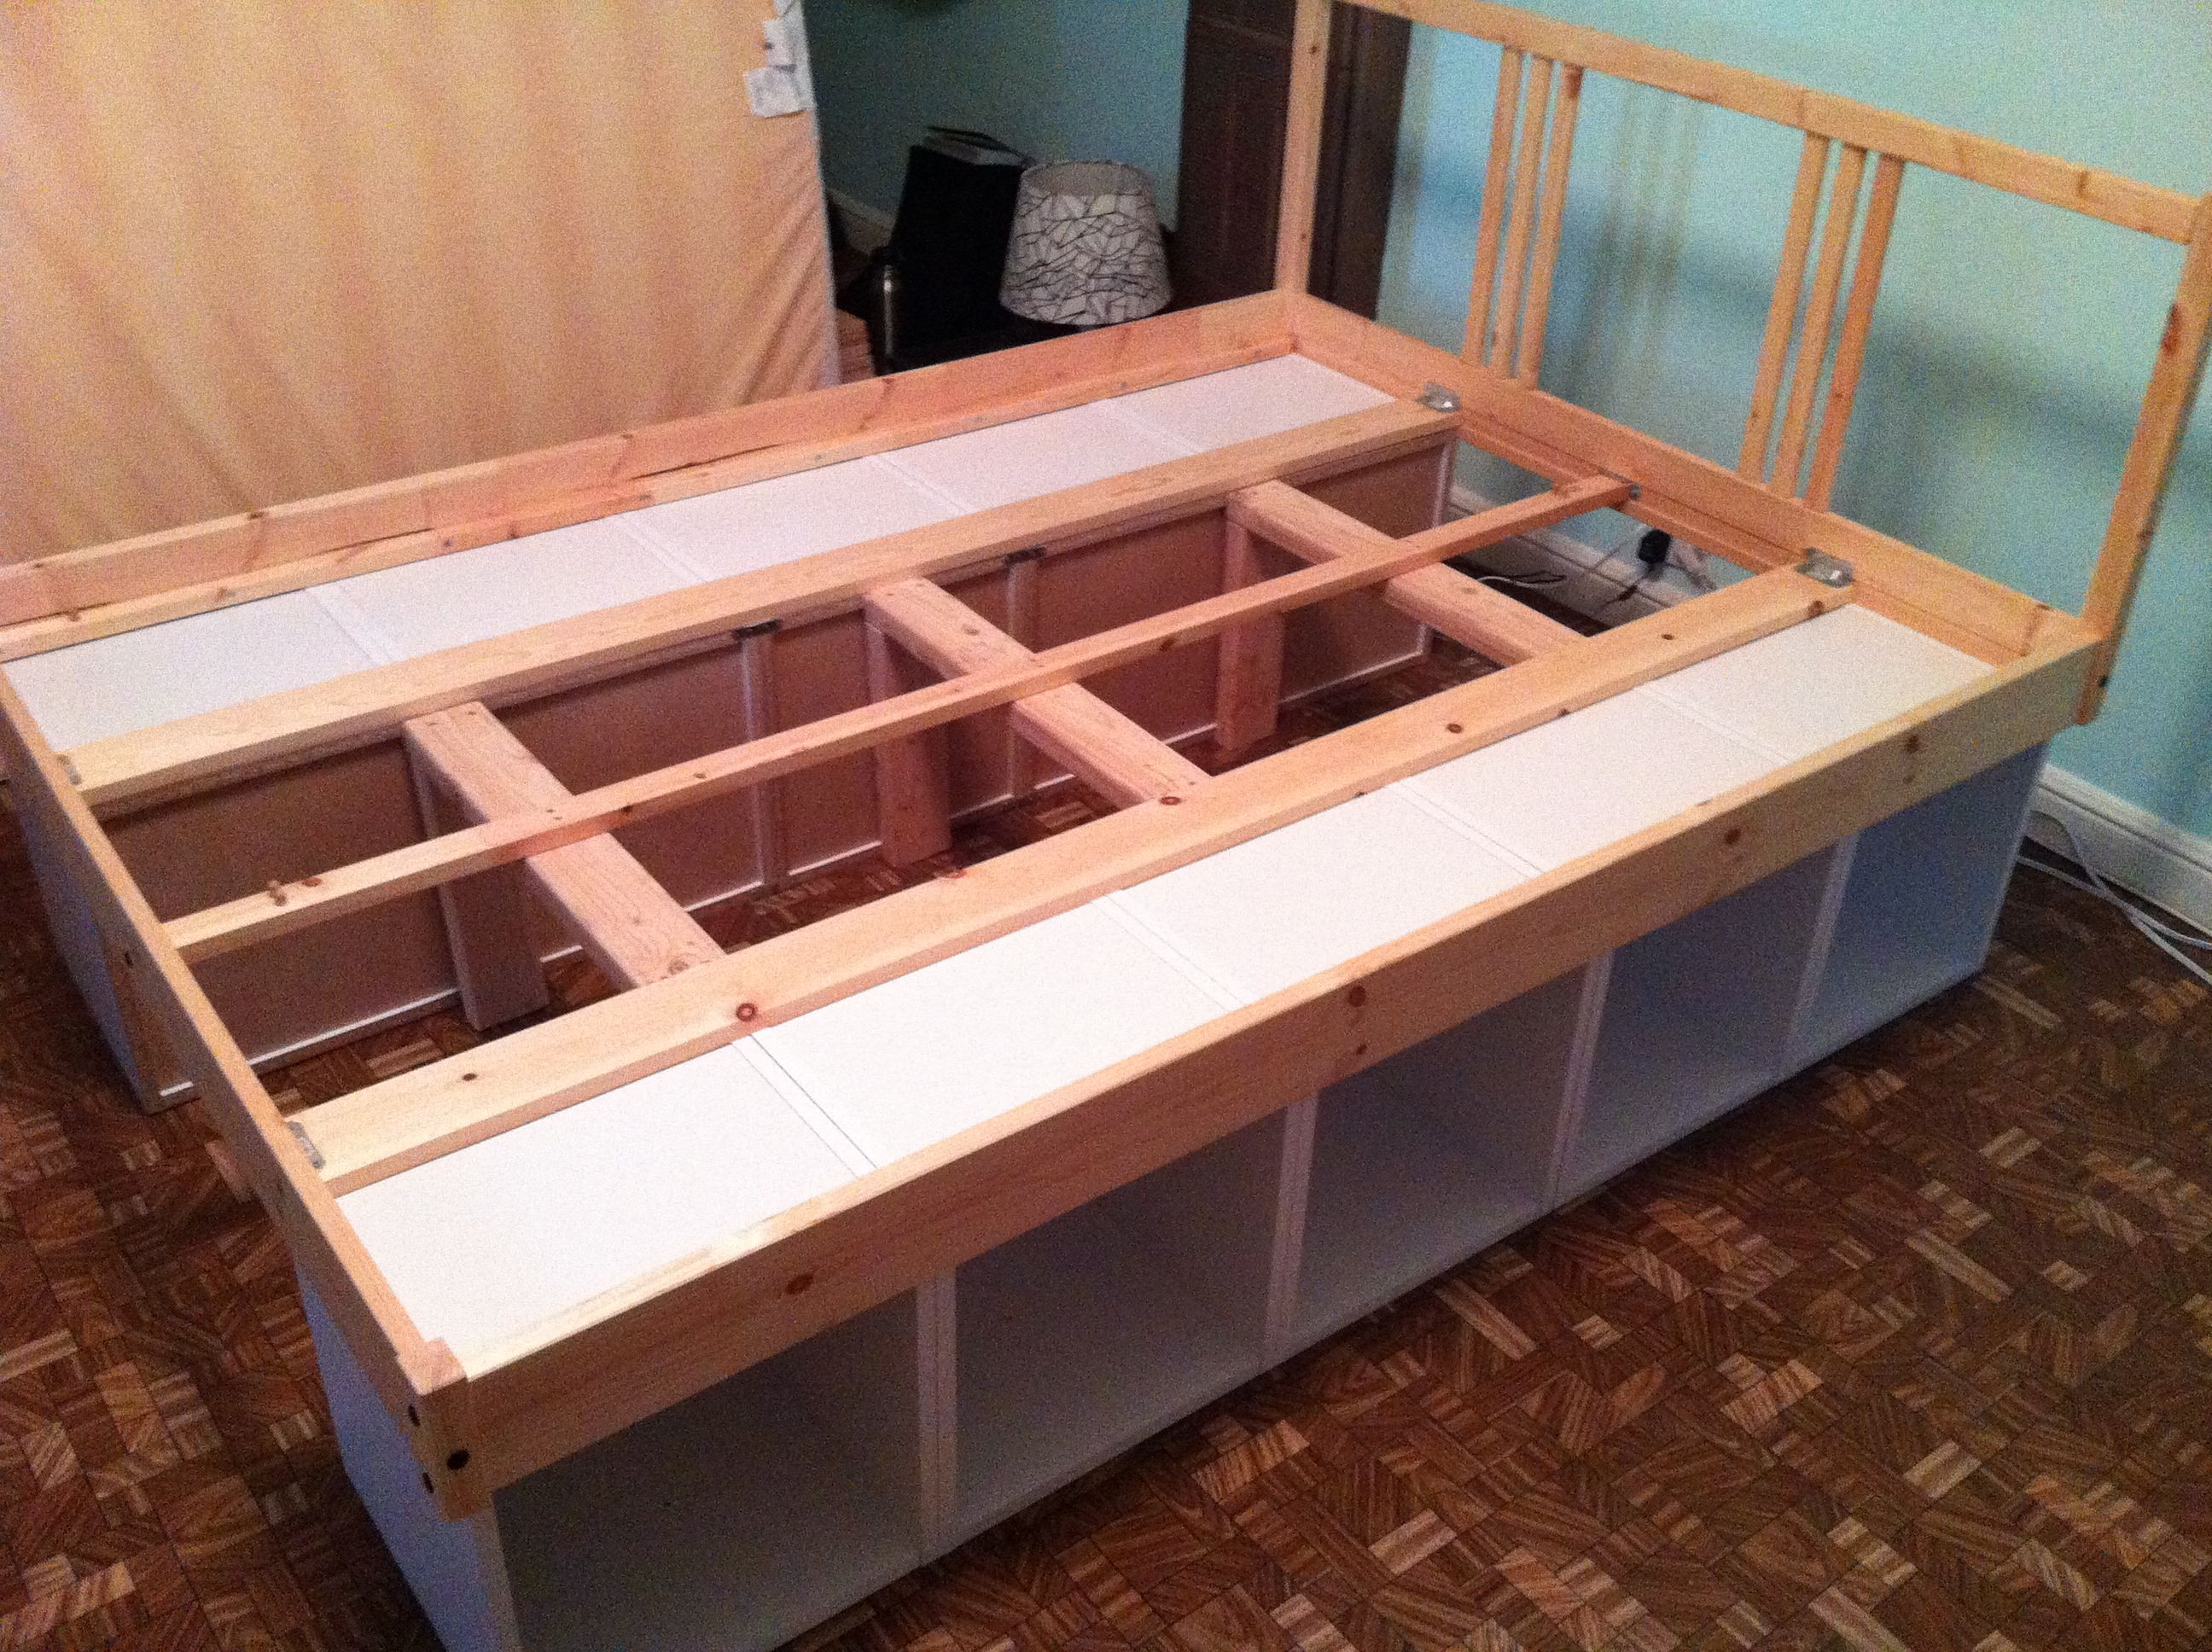 Captivating Ikea Hack Bed Frame Gallery Best inspiration home